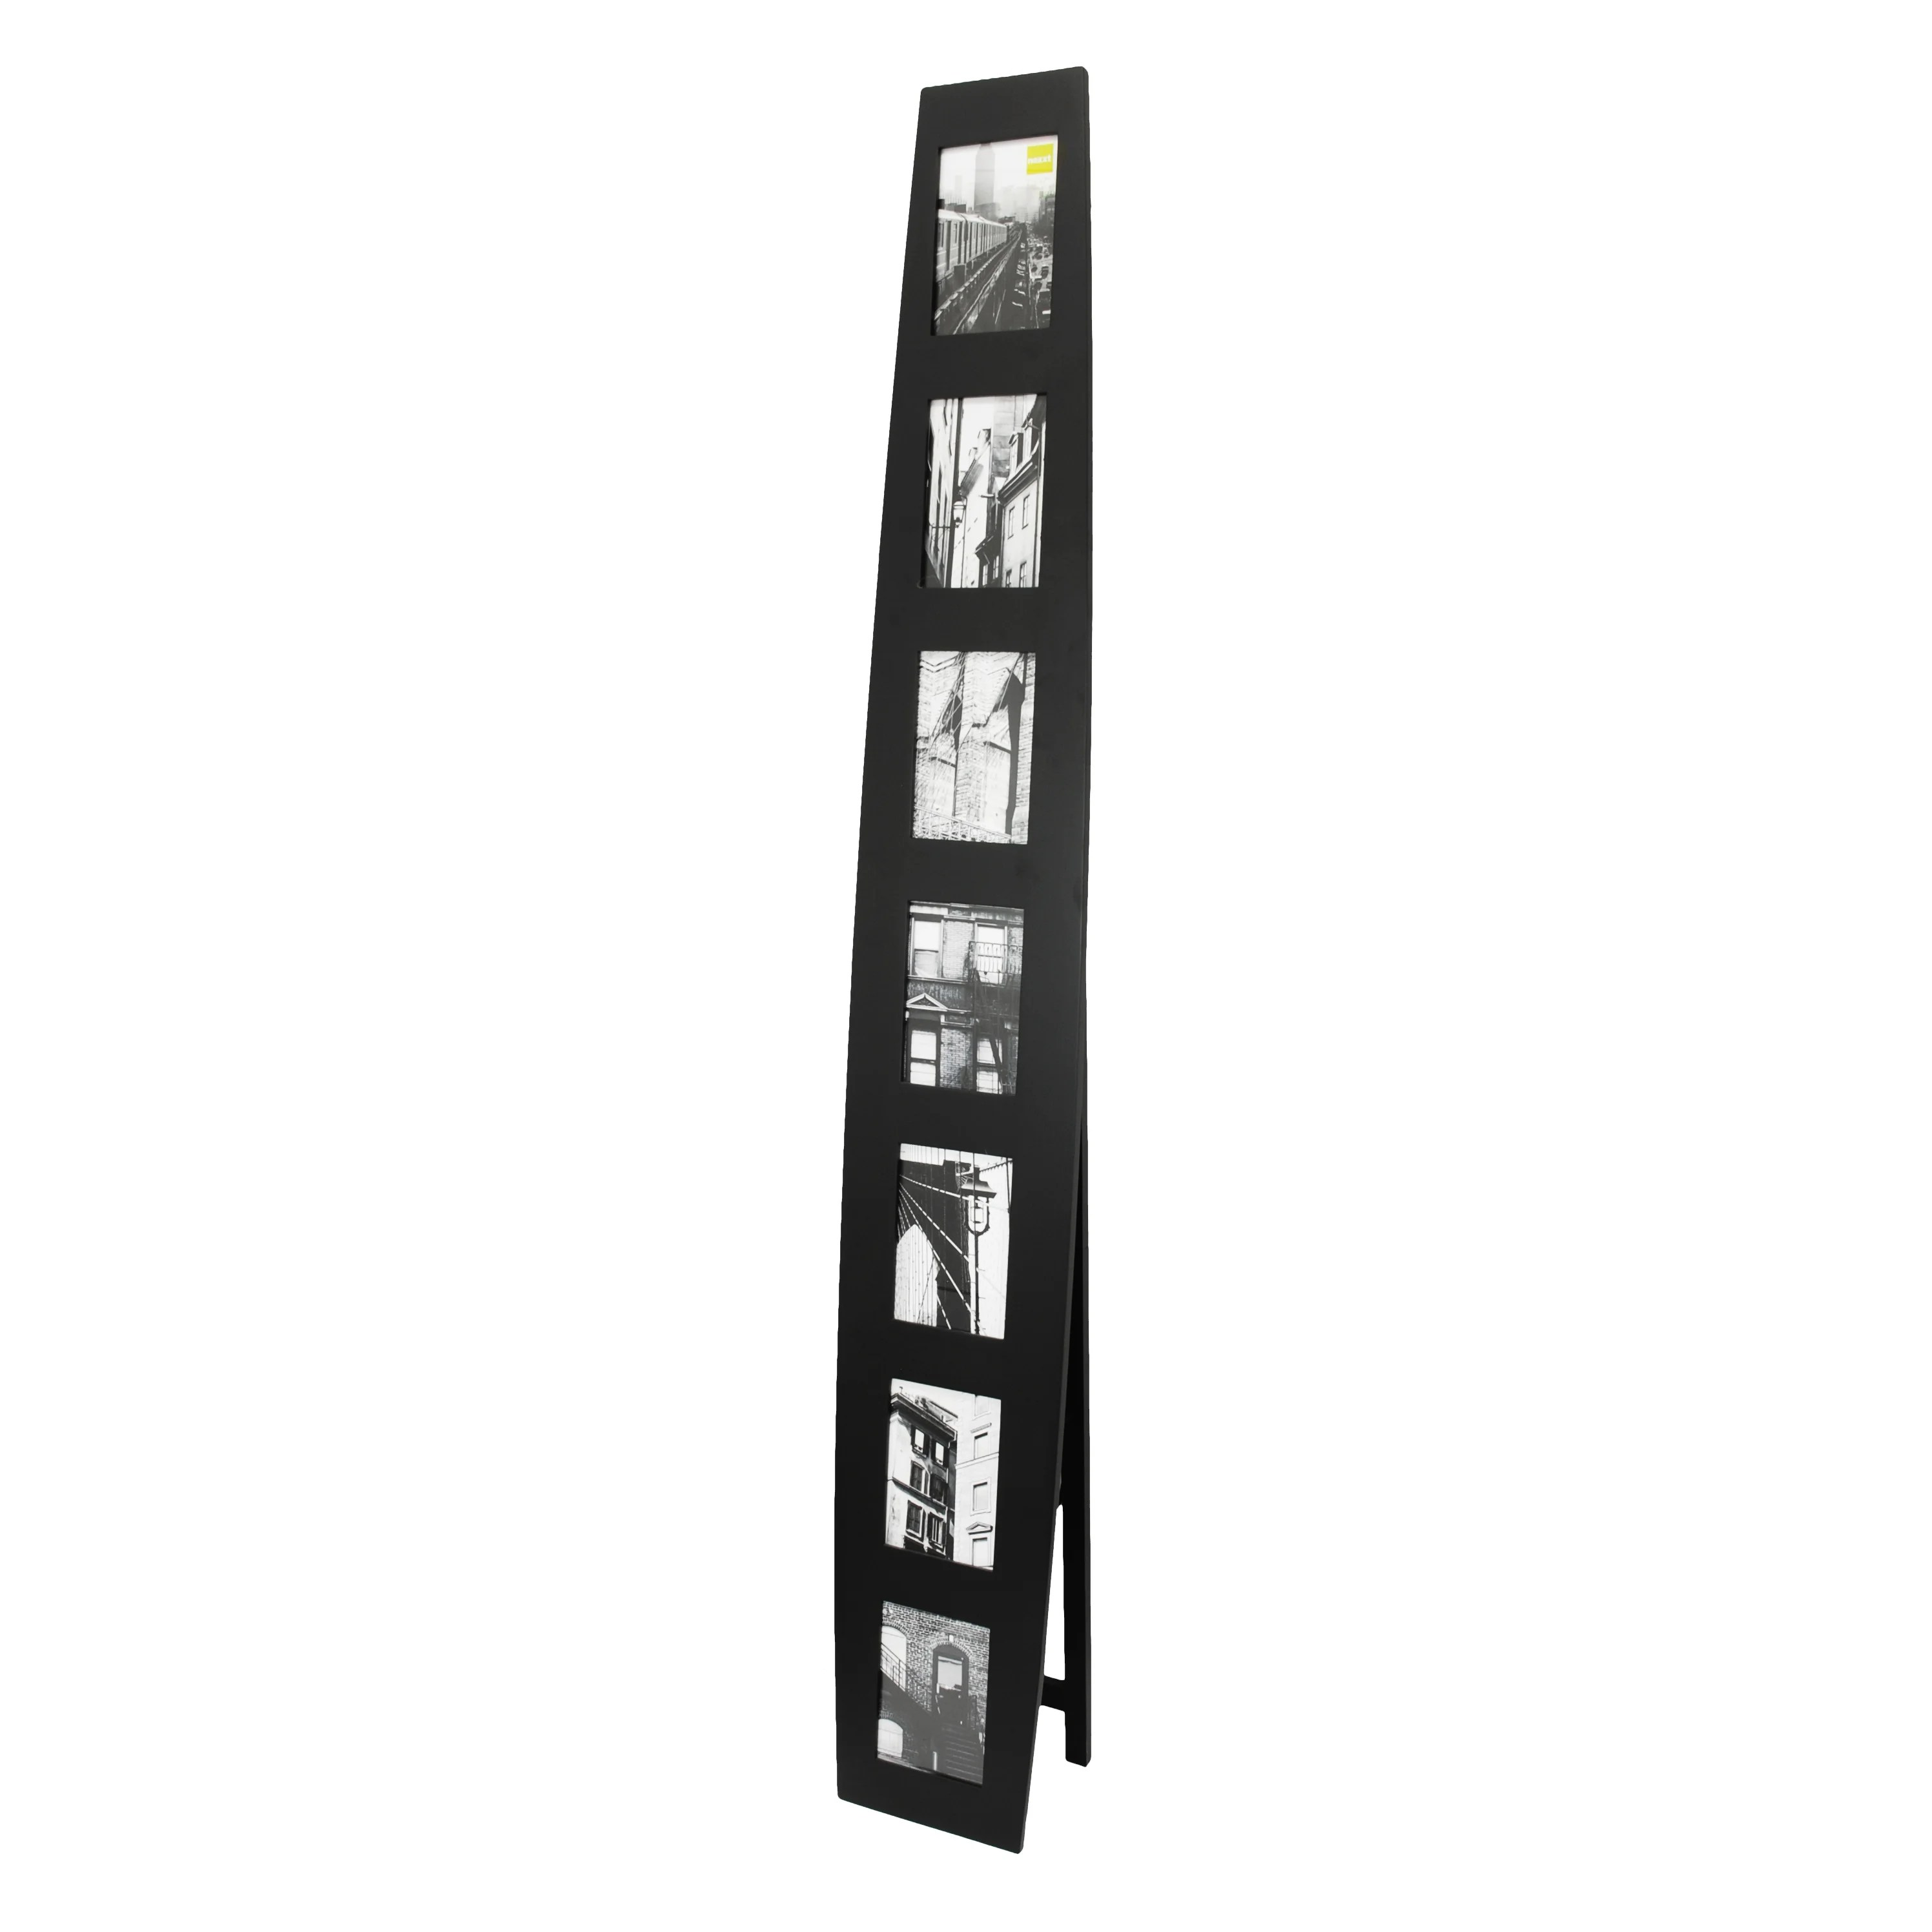 nexxt Design Summit Picture Frame  Reviews  Wayfair